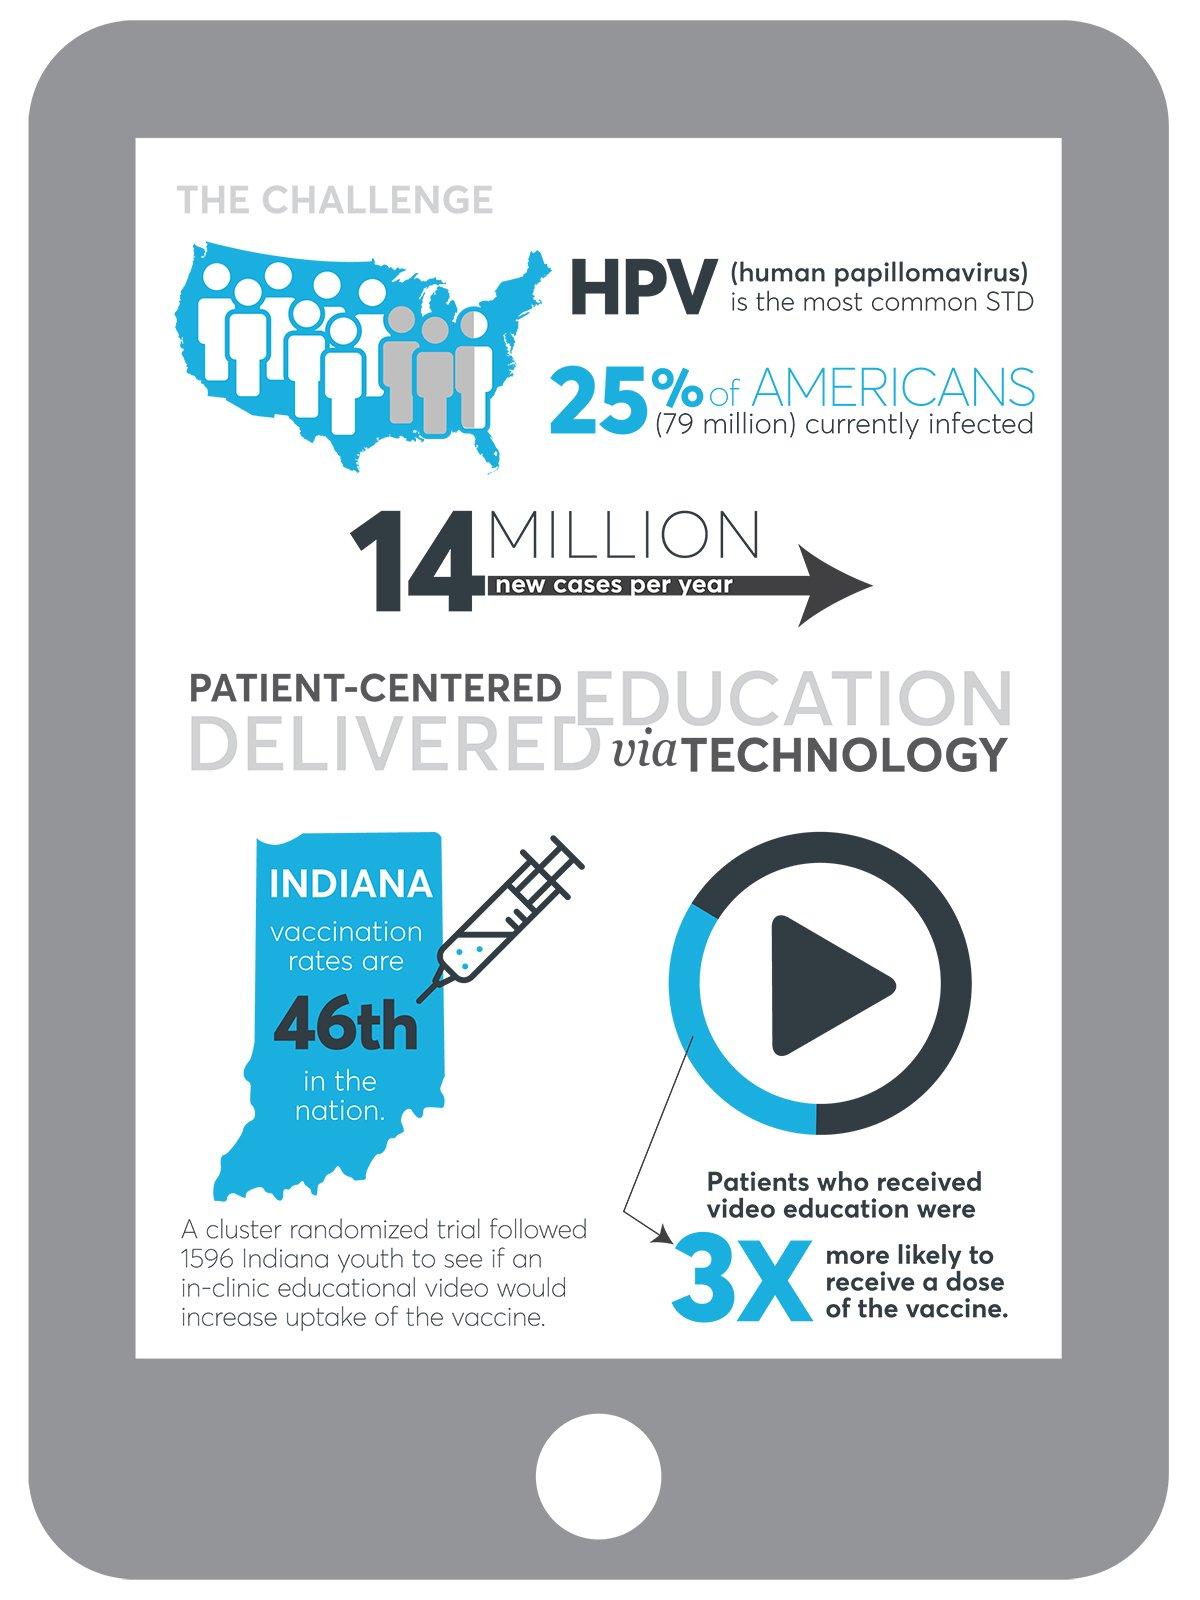 Informational chart on HPV prevelance